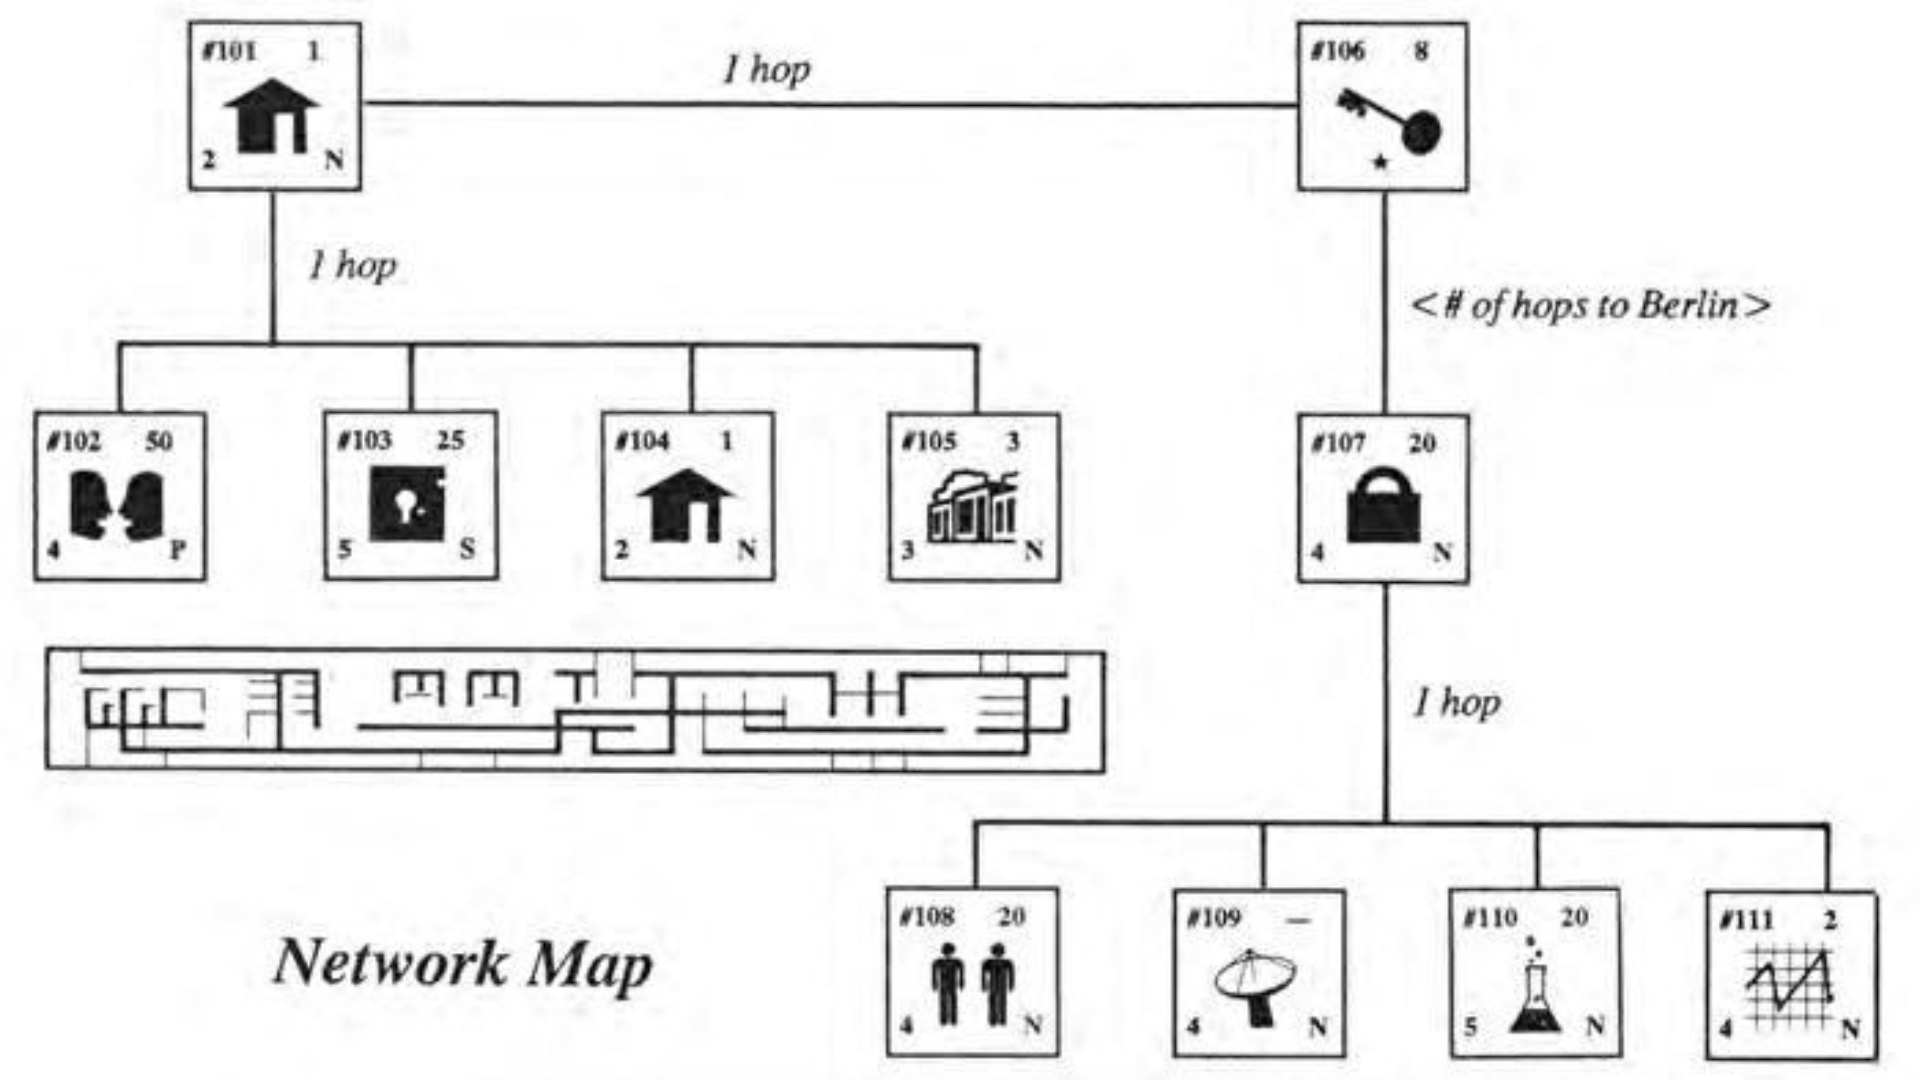 gurps-cyberpunk-rpg-network-map.png